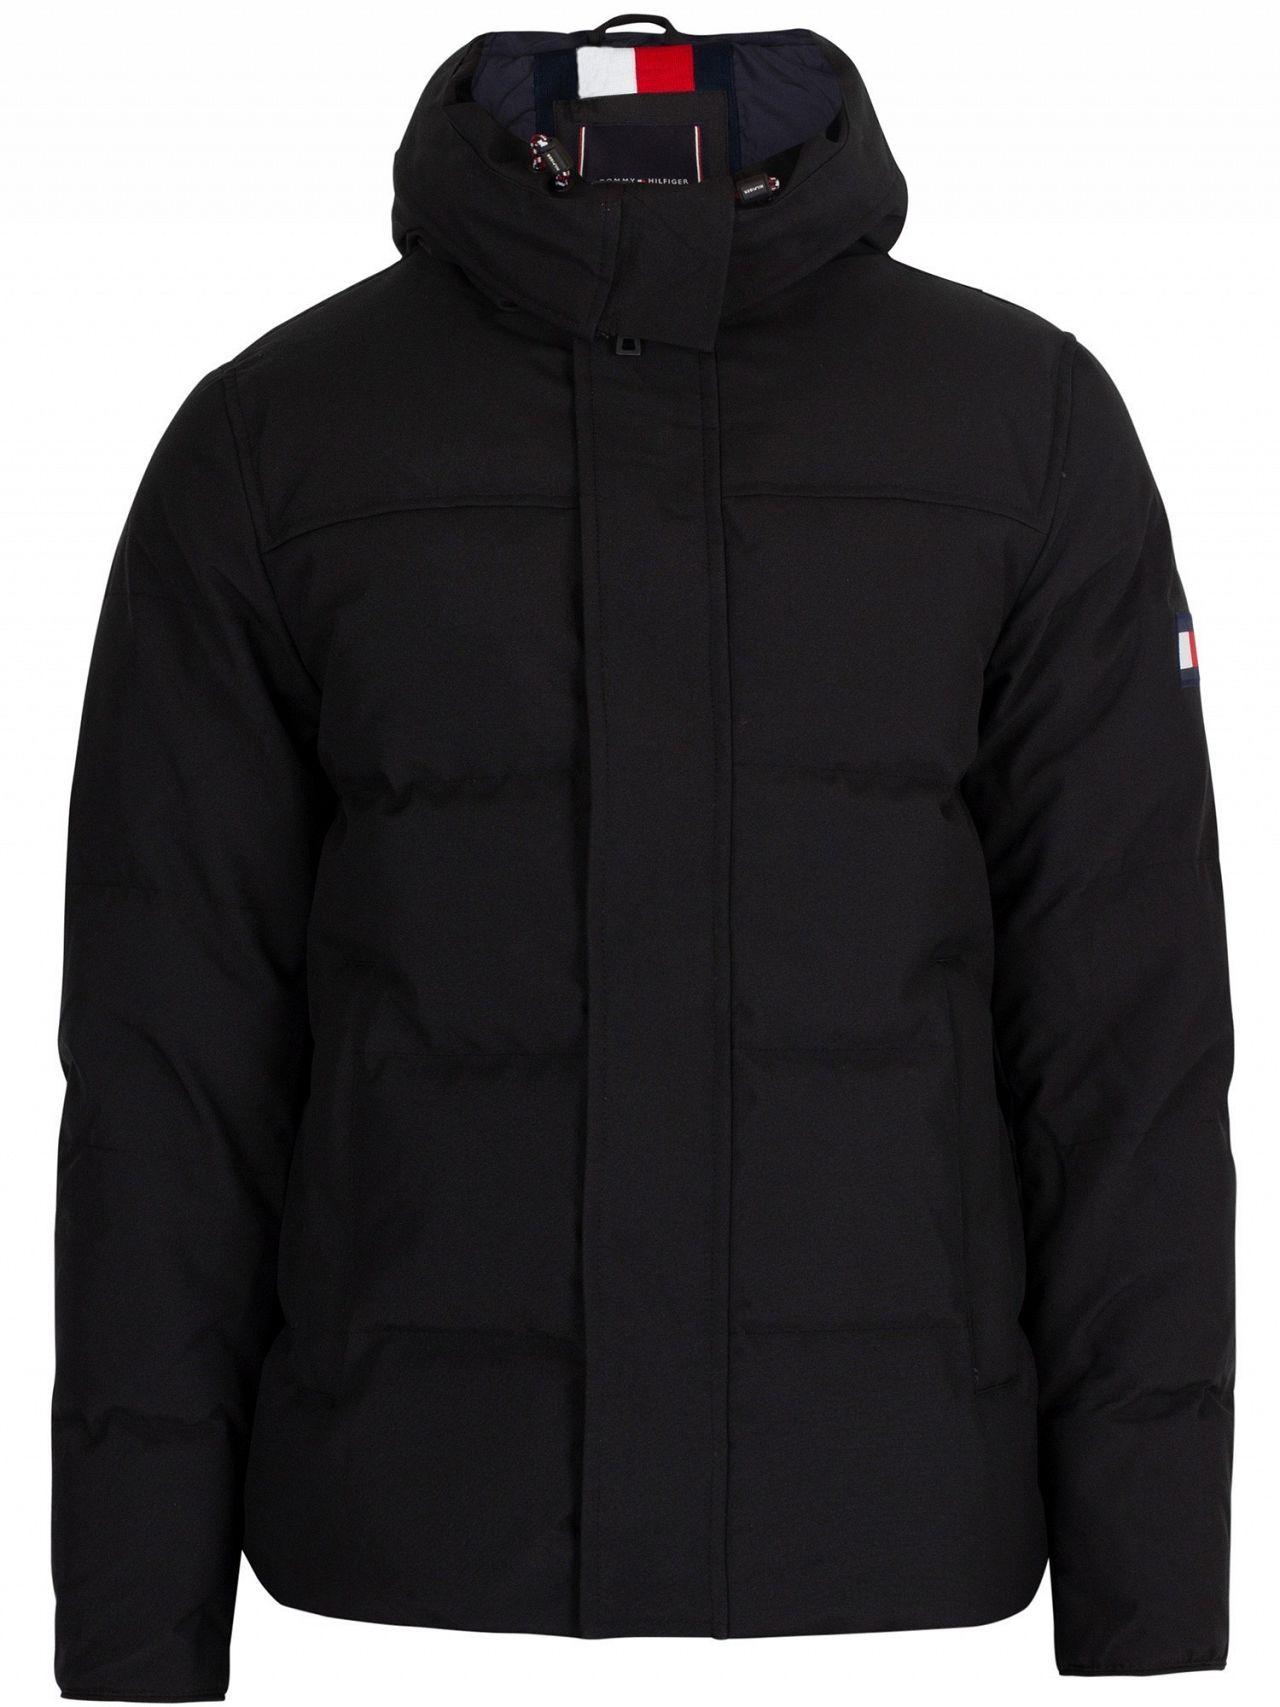 3fe50ec378fa2 Tommy Hilfiger Jet Black Heavy Canvas Down Parka Jacket